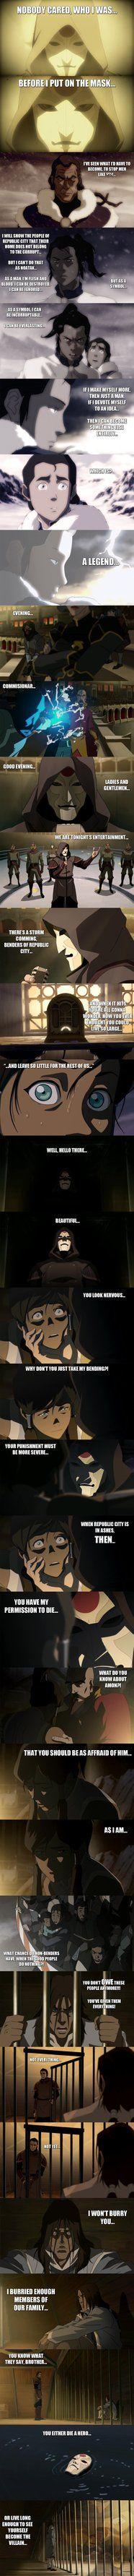 Legend of Korra - Amon rises... by yourparodies.deviantart.com on @DeviantArt